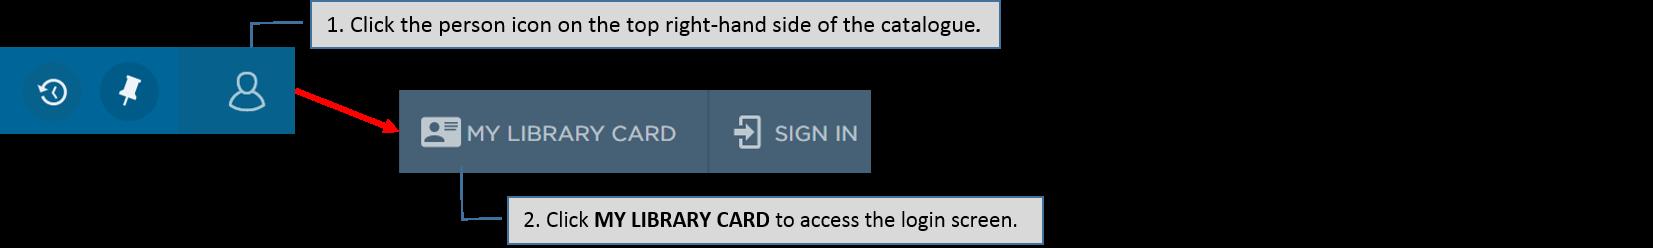 Catalogue – login